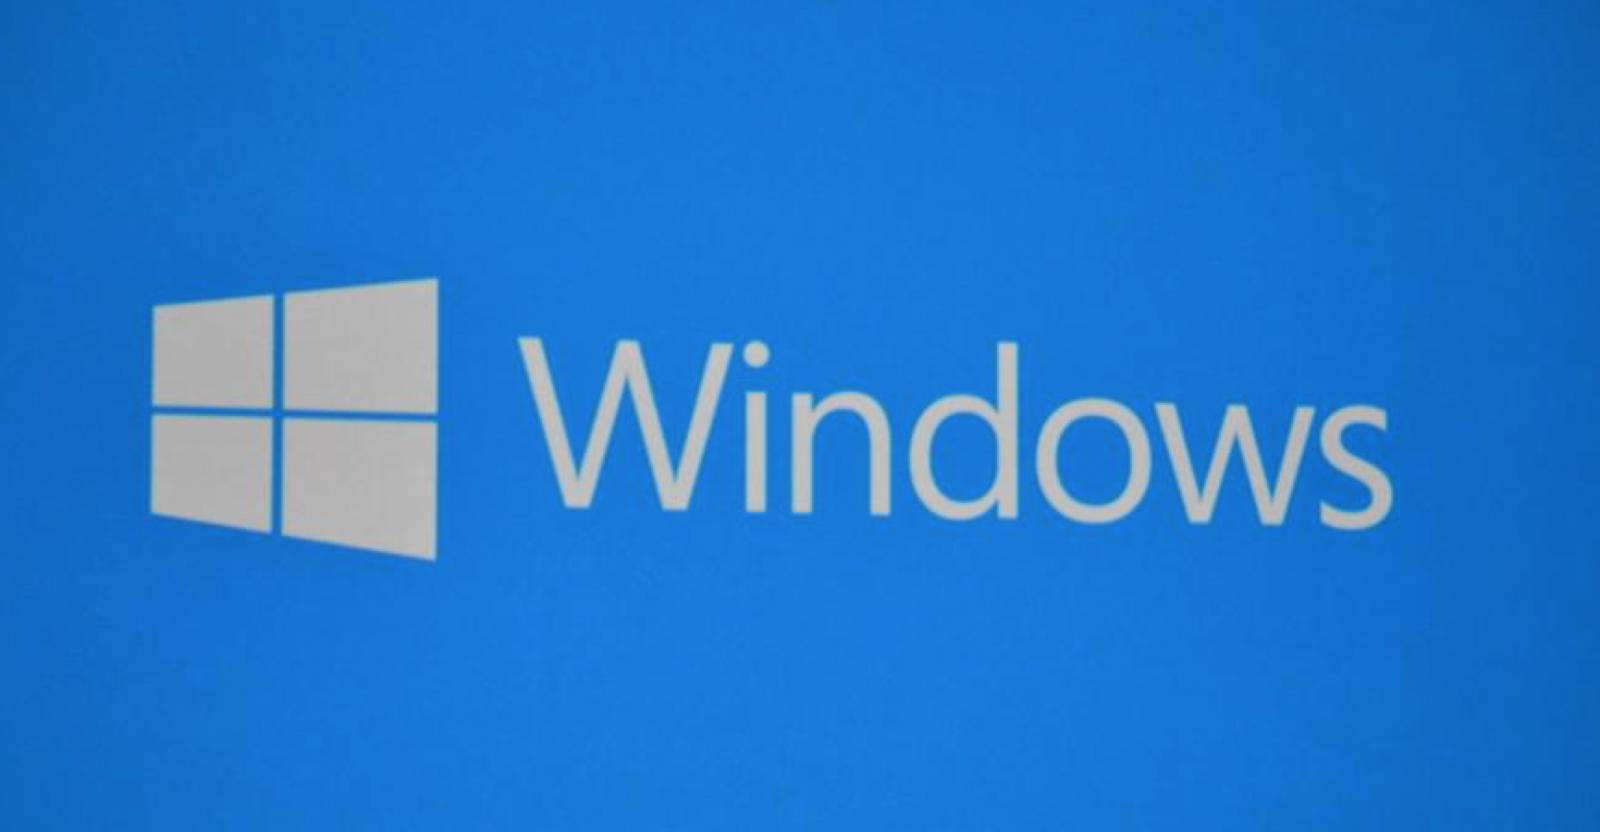 Microsoft Windows 10 upgrade